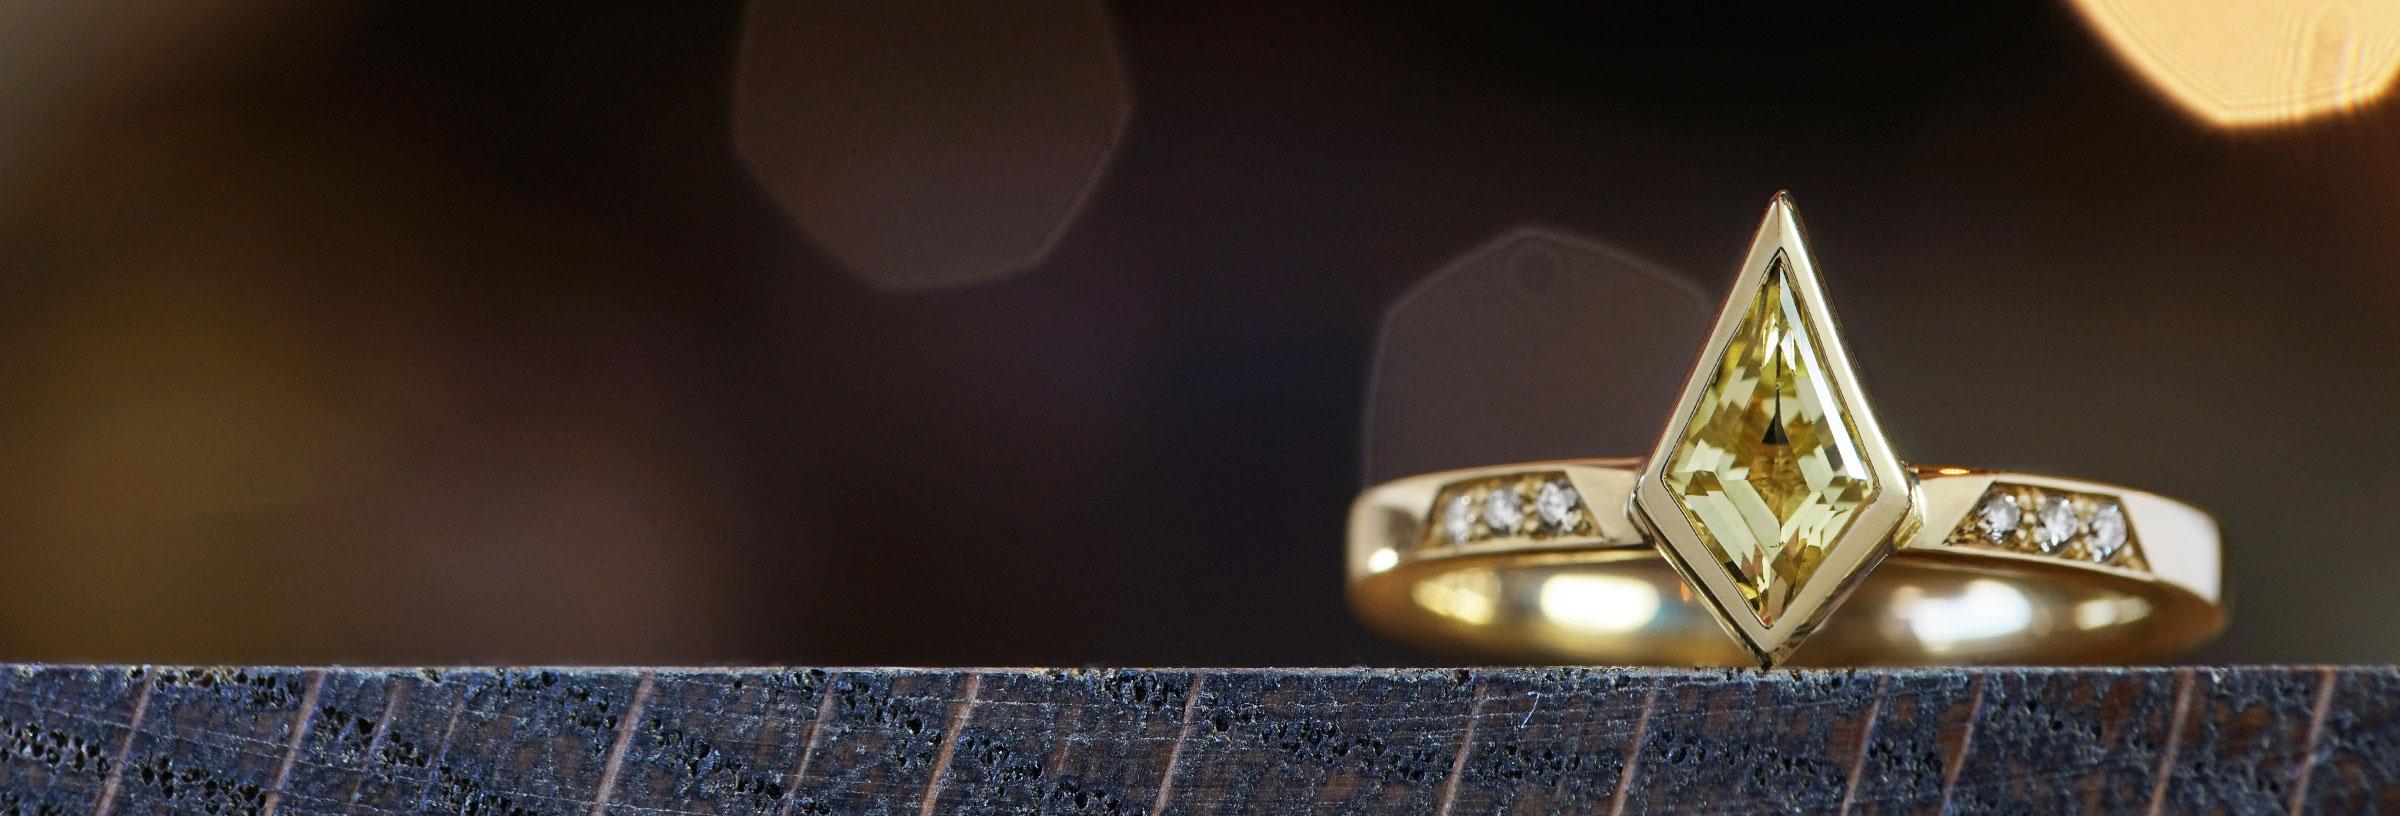 yellow-gold-kite-cut-yellow-tourmaline-and-diamond-engagement-ring